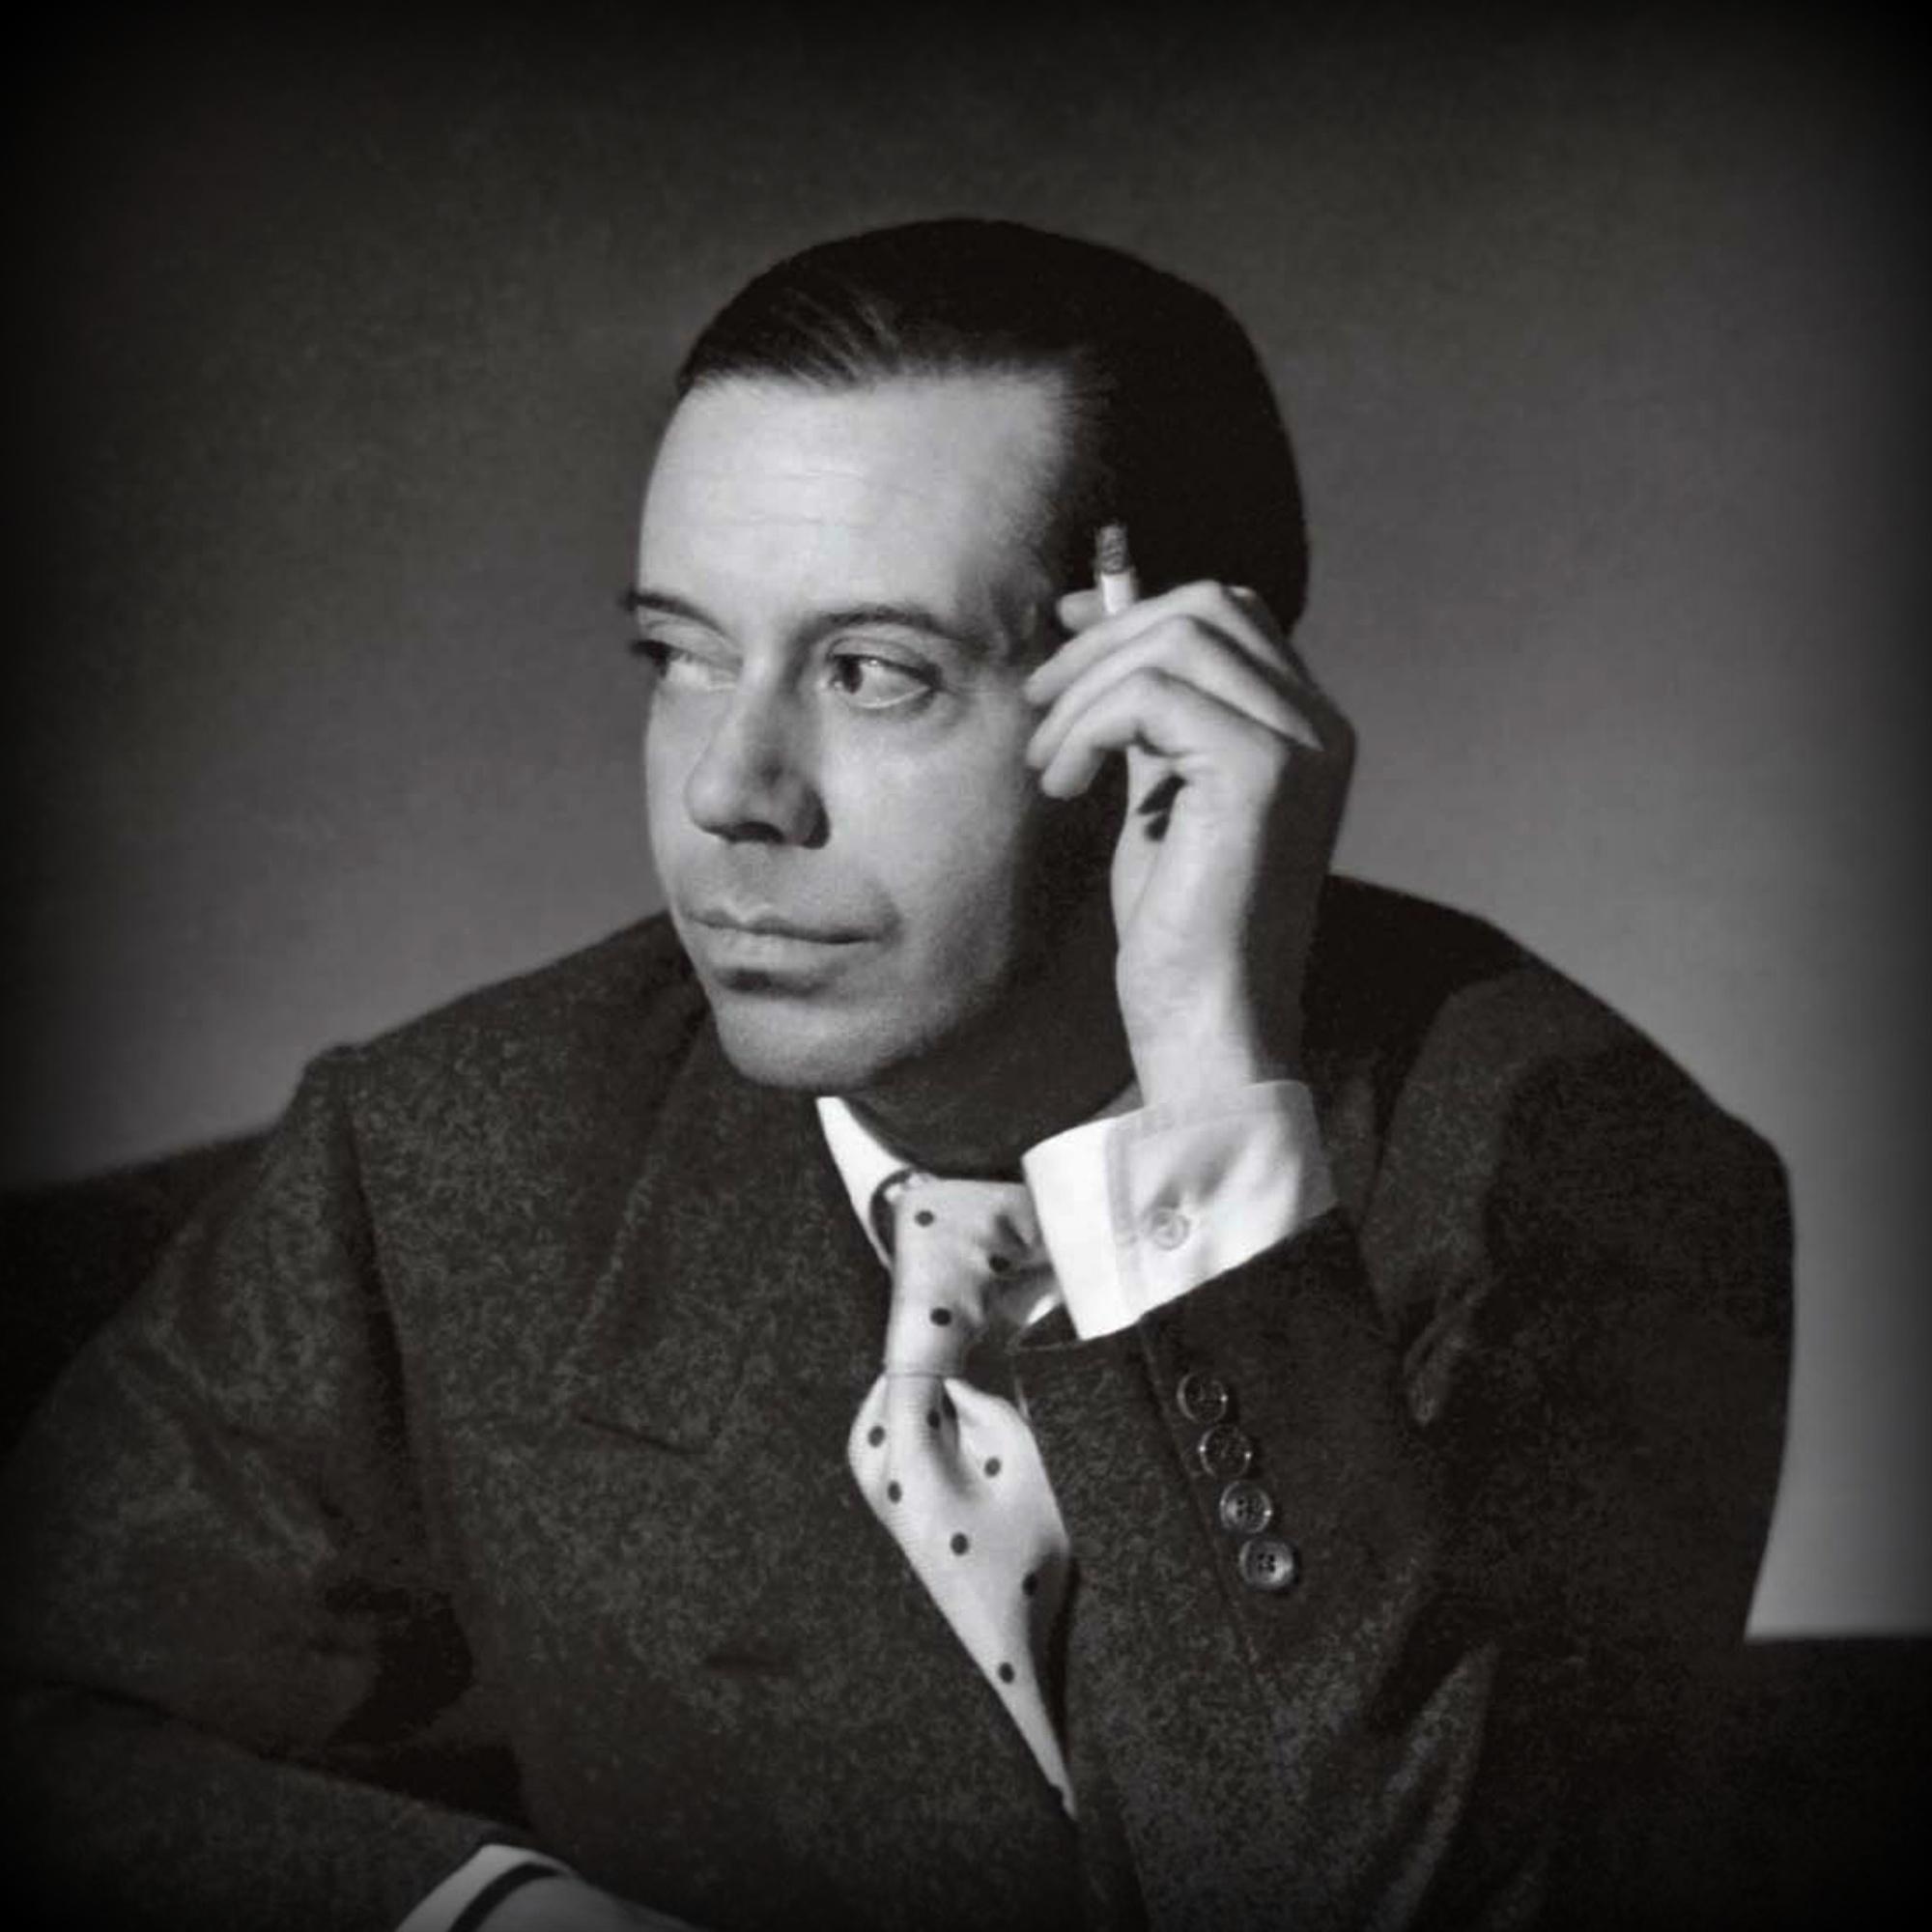 Cole Porter (1935)